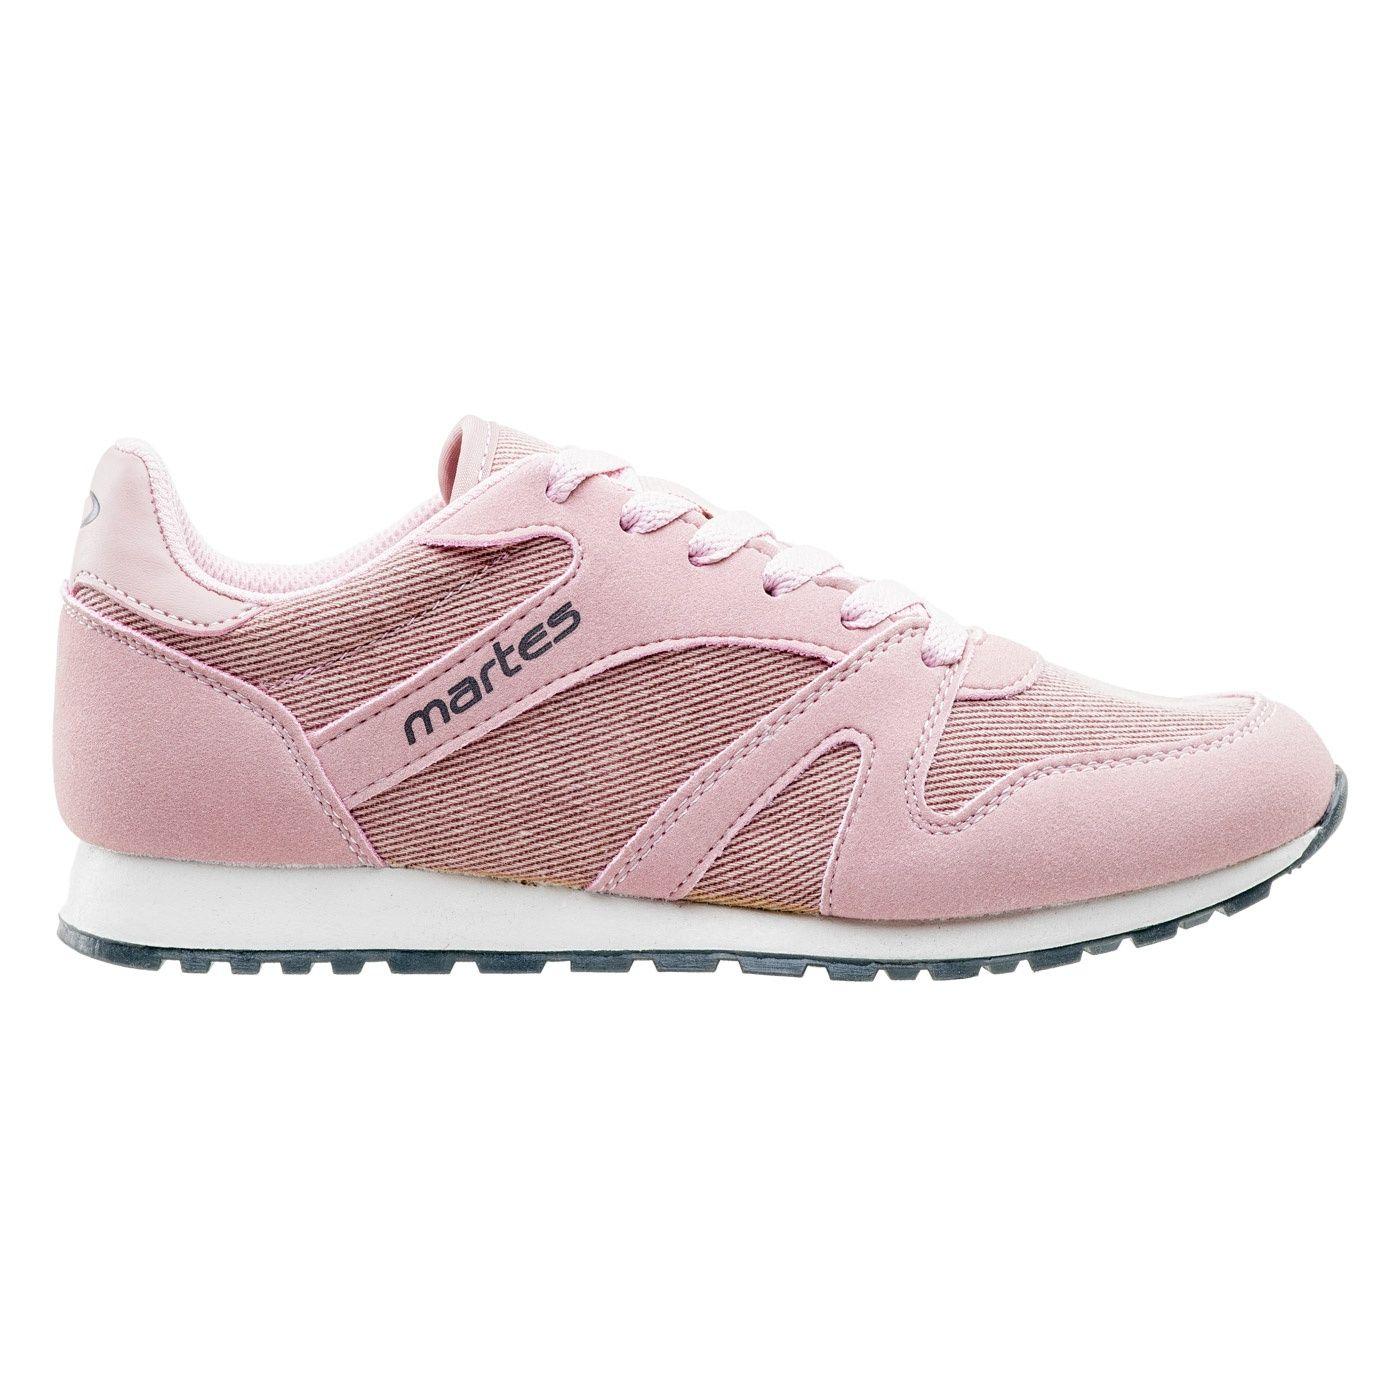 Damskie Buty Unika Wo S 96796 Pink Creme Martes Internetowy Sklep Sportowy Martes Sport Shoes Sneakers Pink